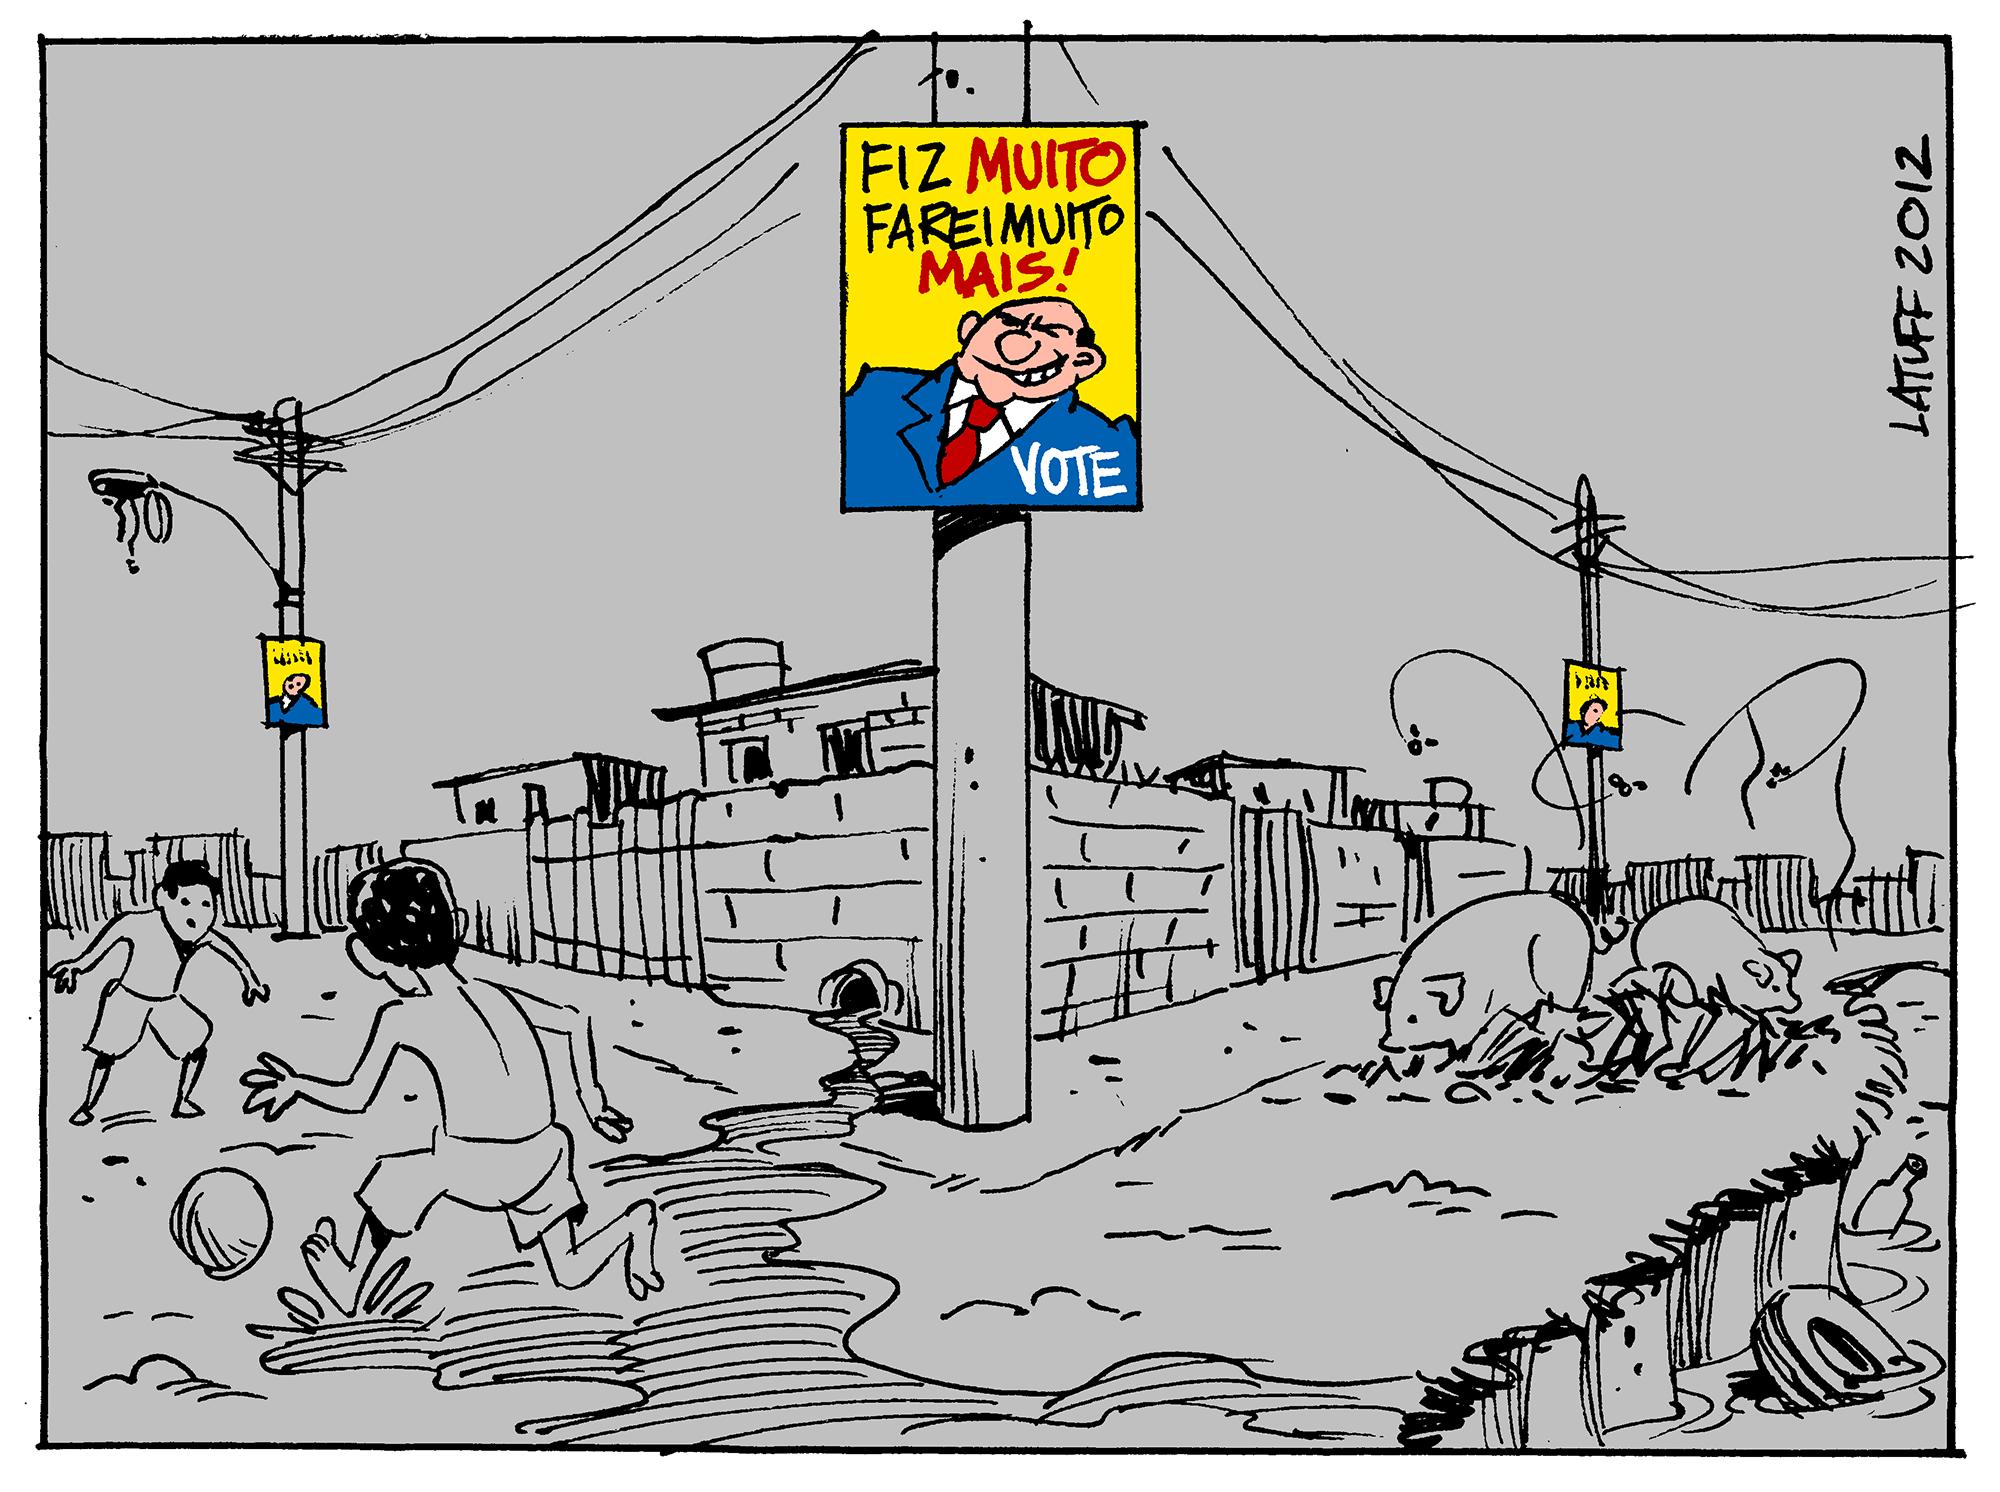 Charge: Latuff